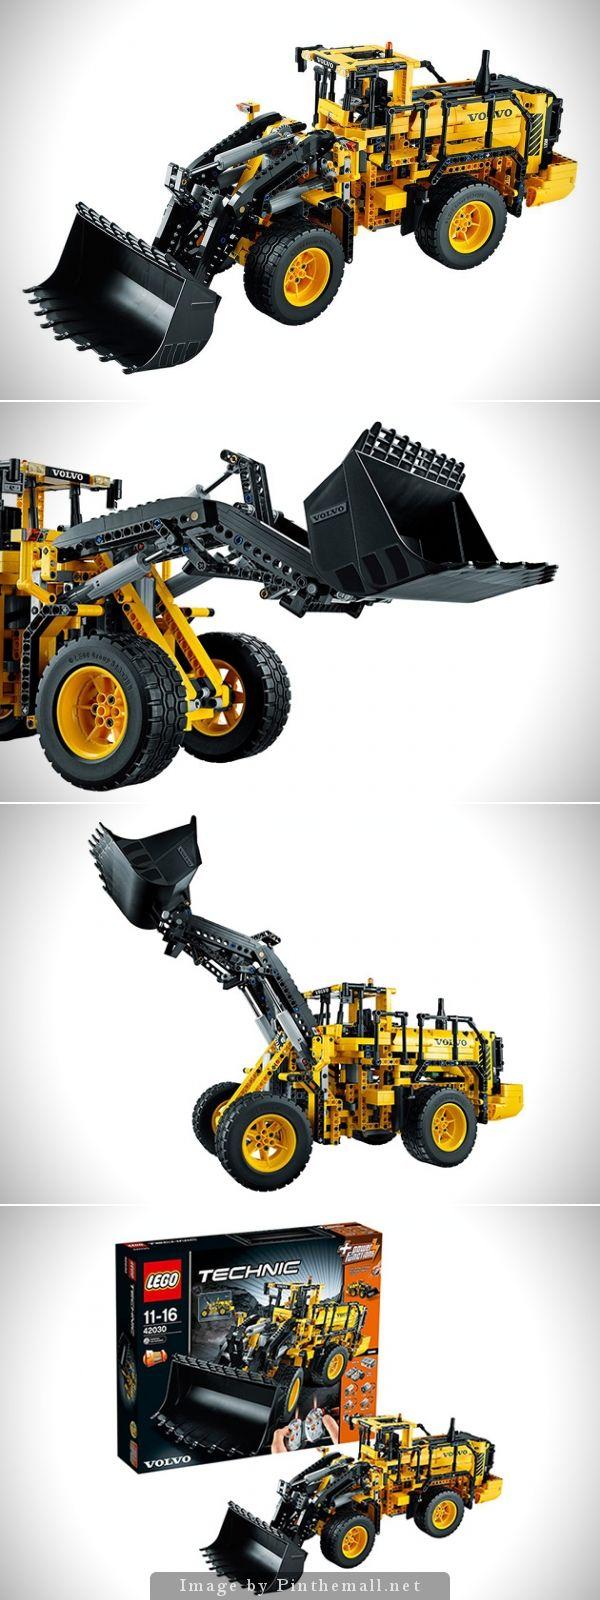 Lego technic Volvo L350F wheel loader 42030 http://www.shopprice.com.au/lego+toys